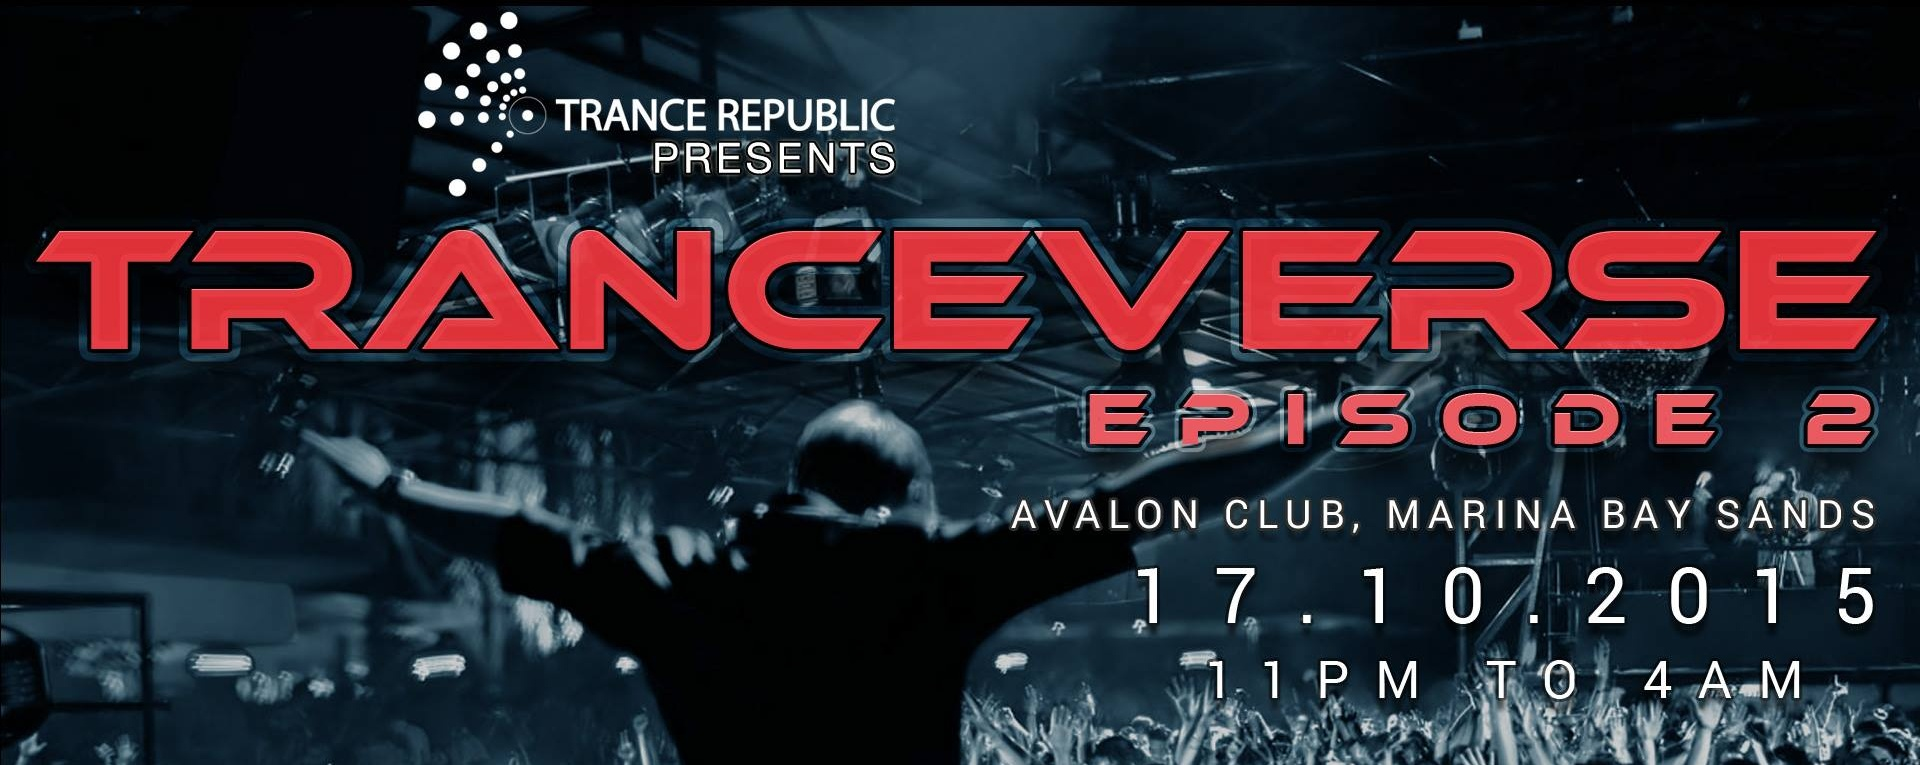 Trance Republic Presents: Tranceverse Ep 2